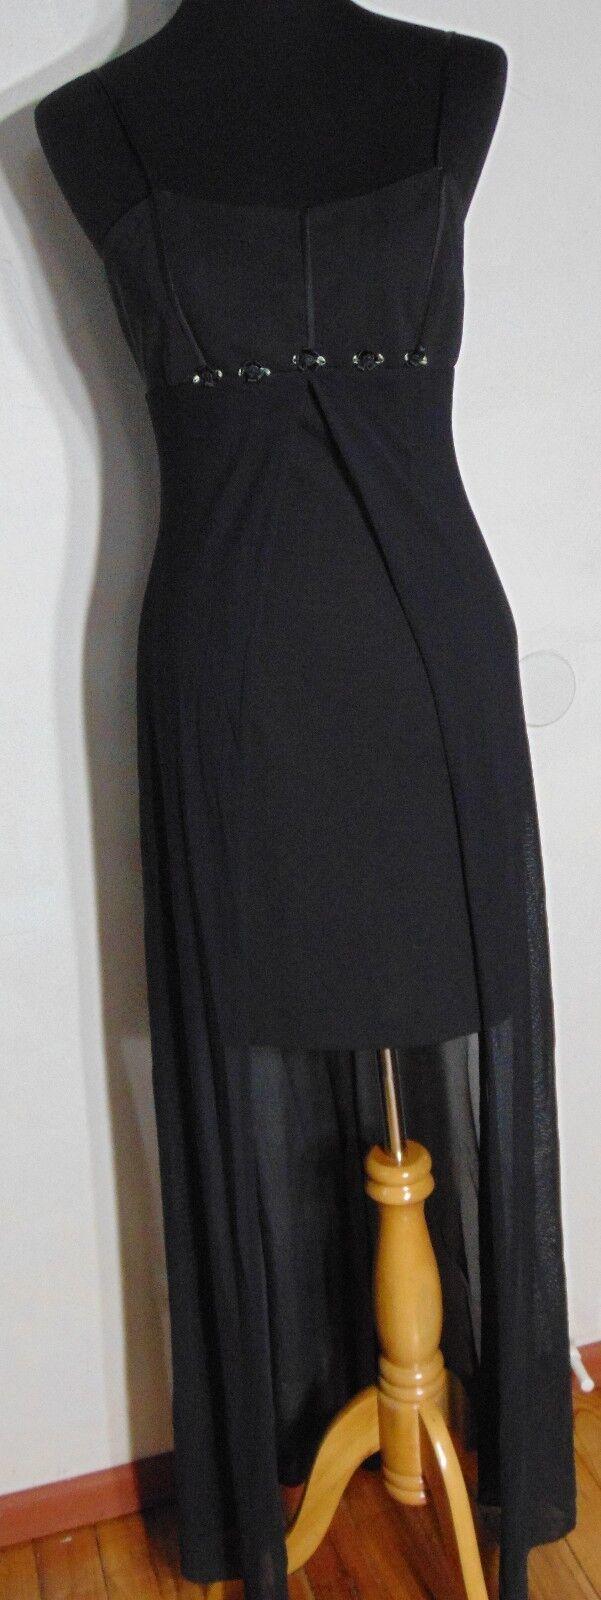 Blondie Nights Vintage Jrs. Black Sheath Dress/Chiffon Overlay Size 7-8 Made USA